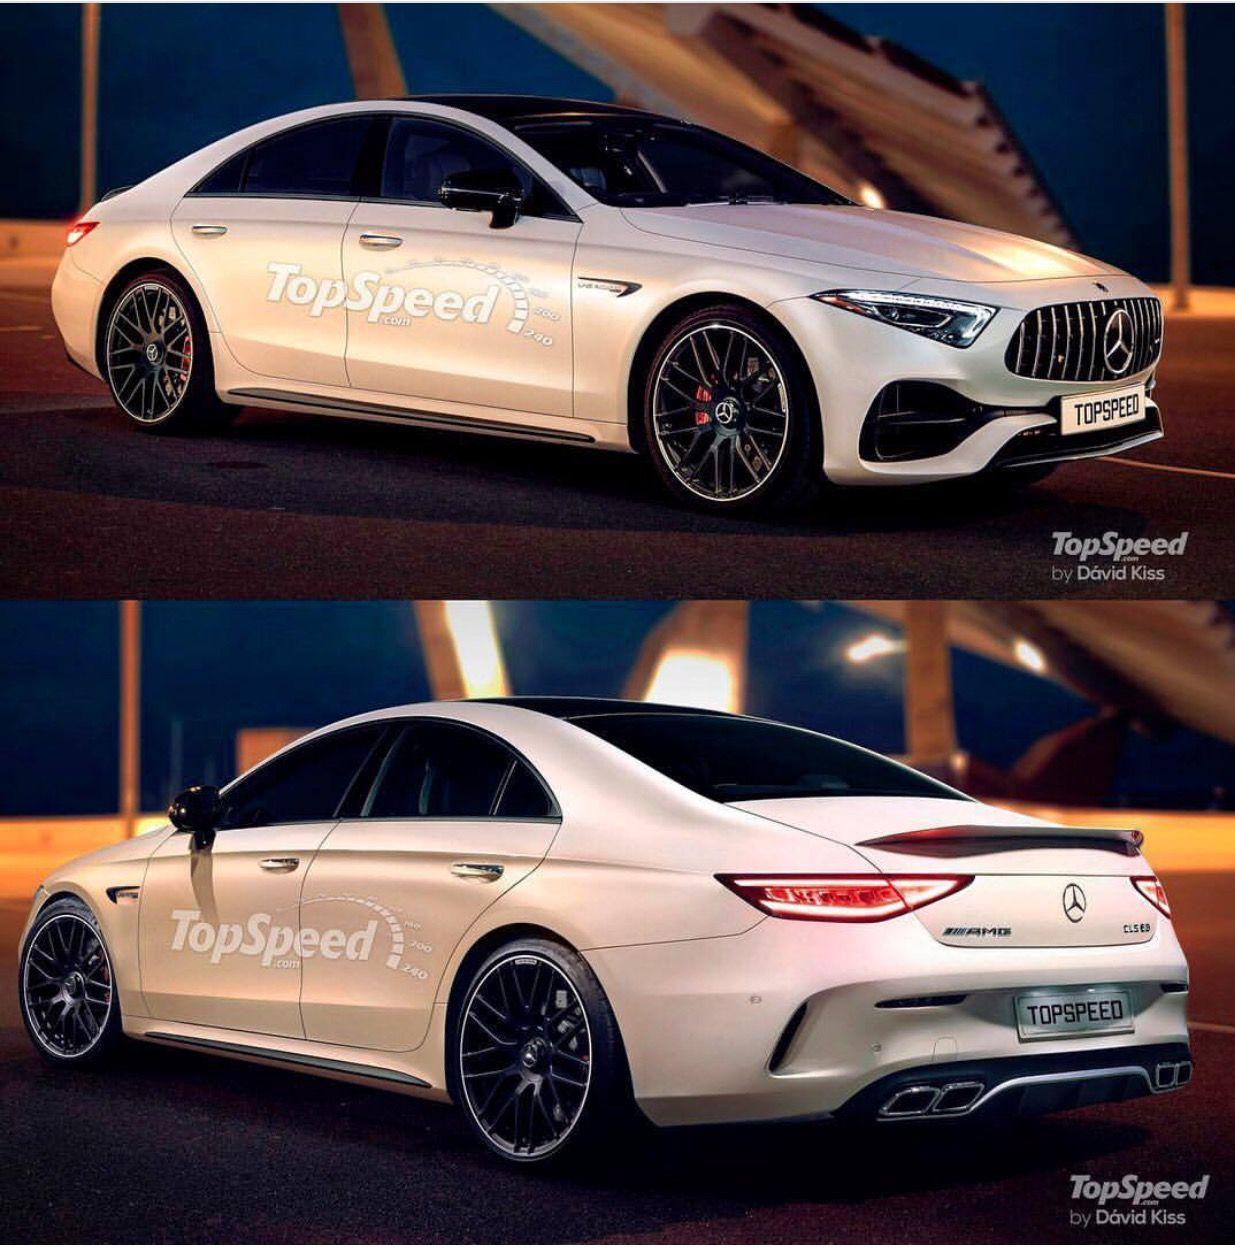 2019 Mercedes Benz Mercedes Amg Cls Camshaft: 2018 Mercedes Benz CLE